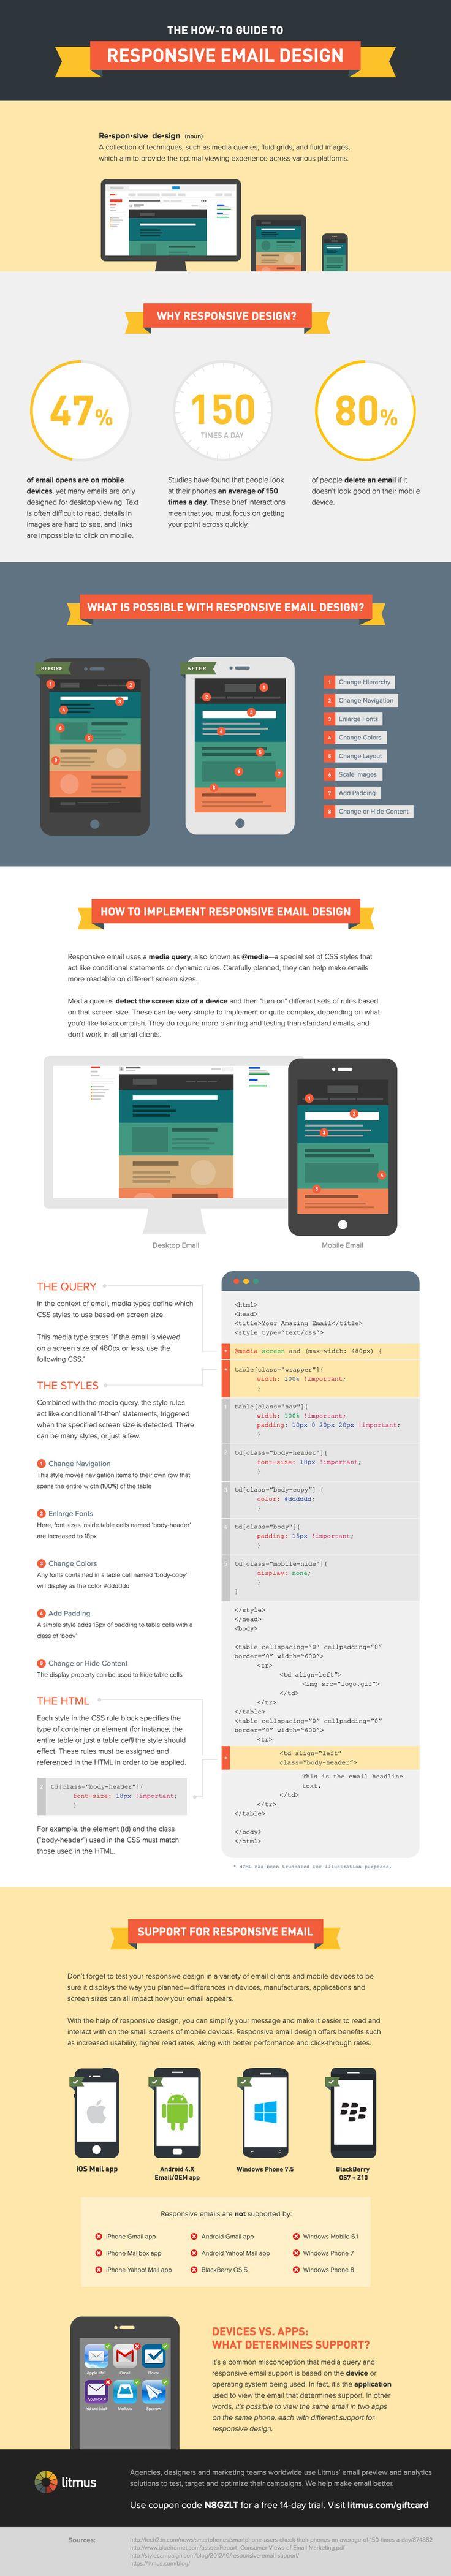 Creating a Responsive Email Design #Infographic   via #BornToBeSocial - Pinterest Marketing